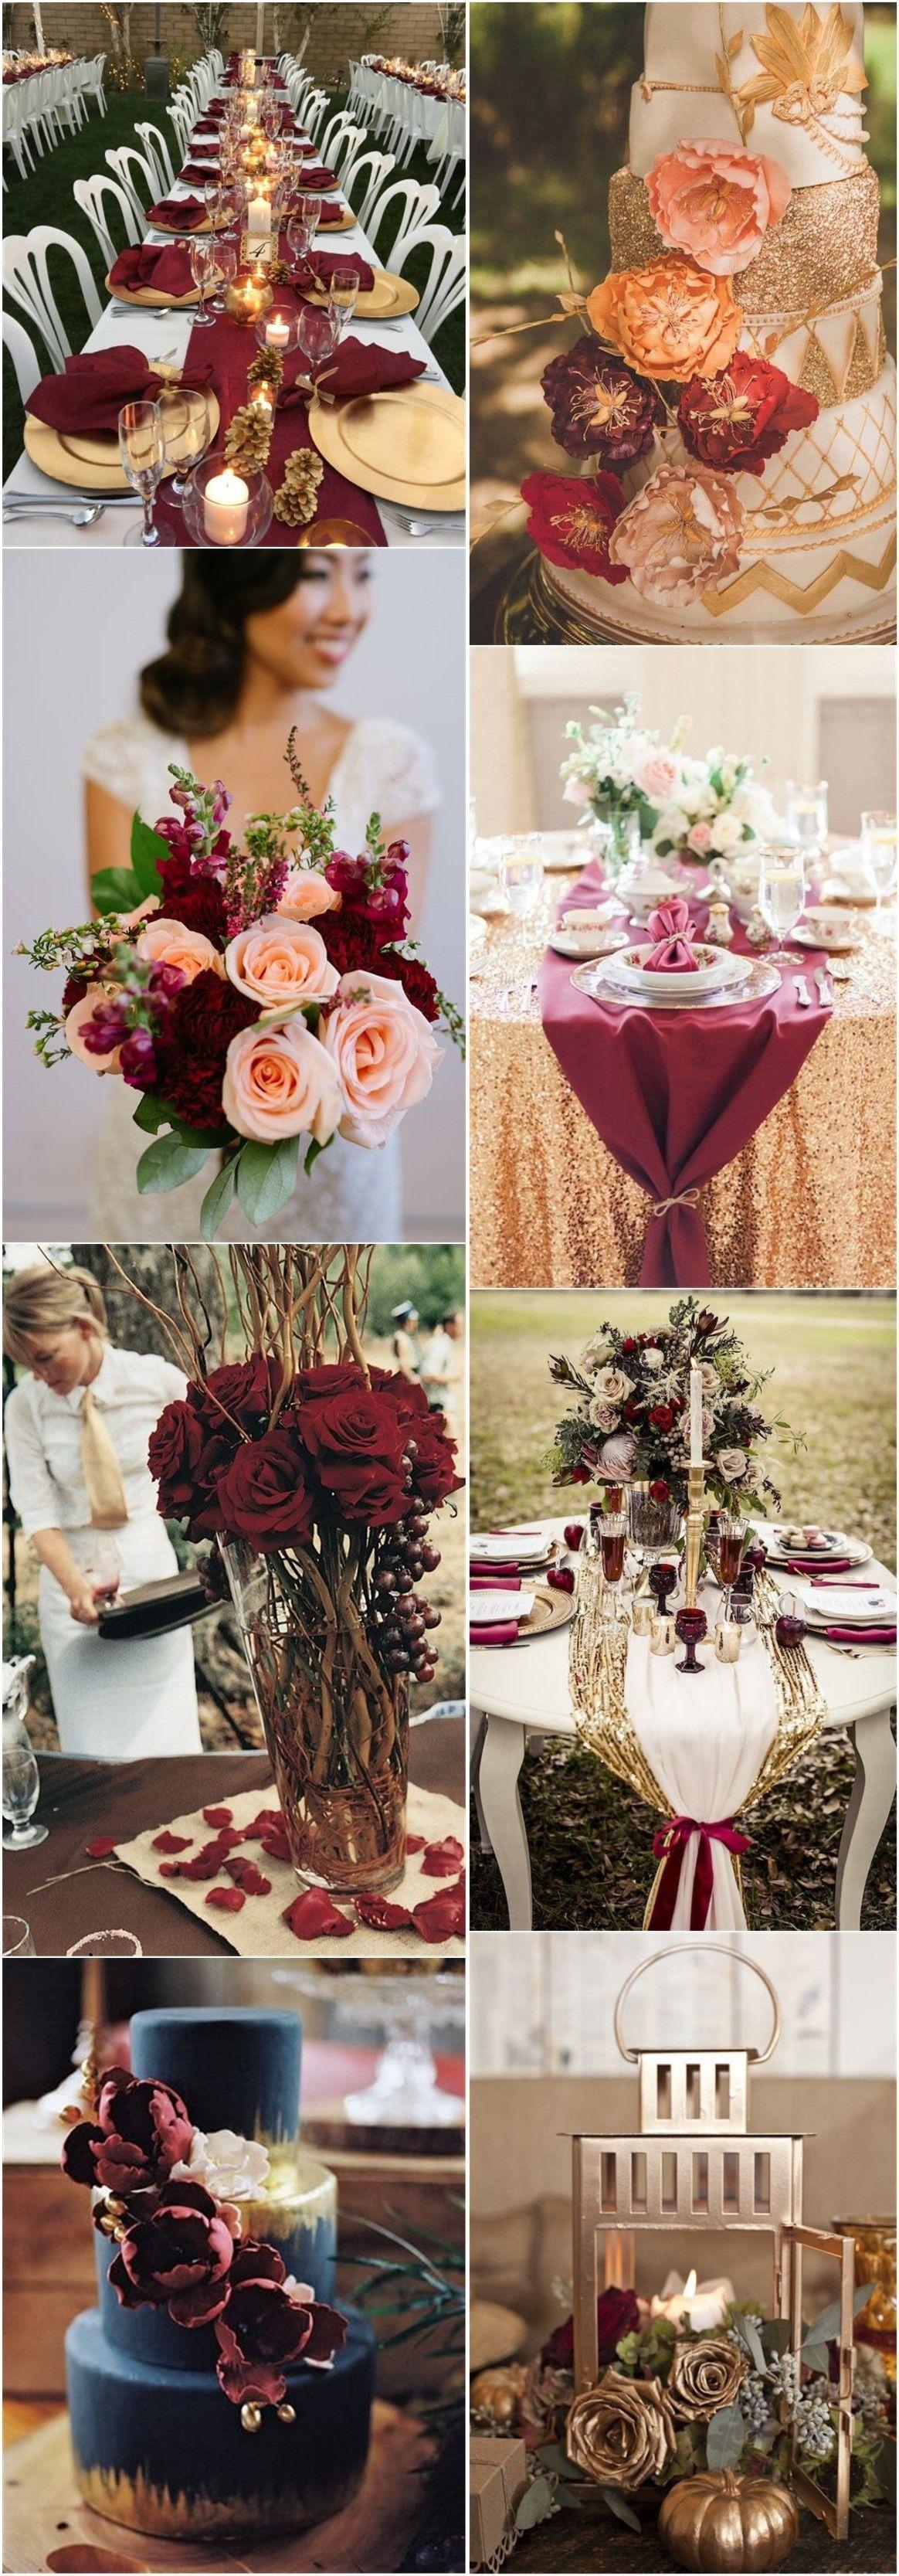 Wedding decoration ideas burgundy   Romantic Burgundy and Rose Gold Fall Wedding Ideas  Wedding